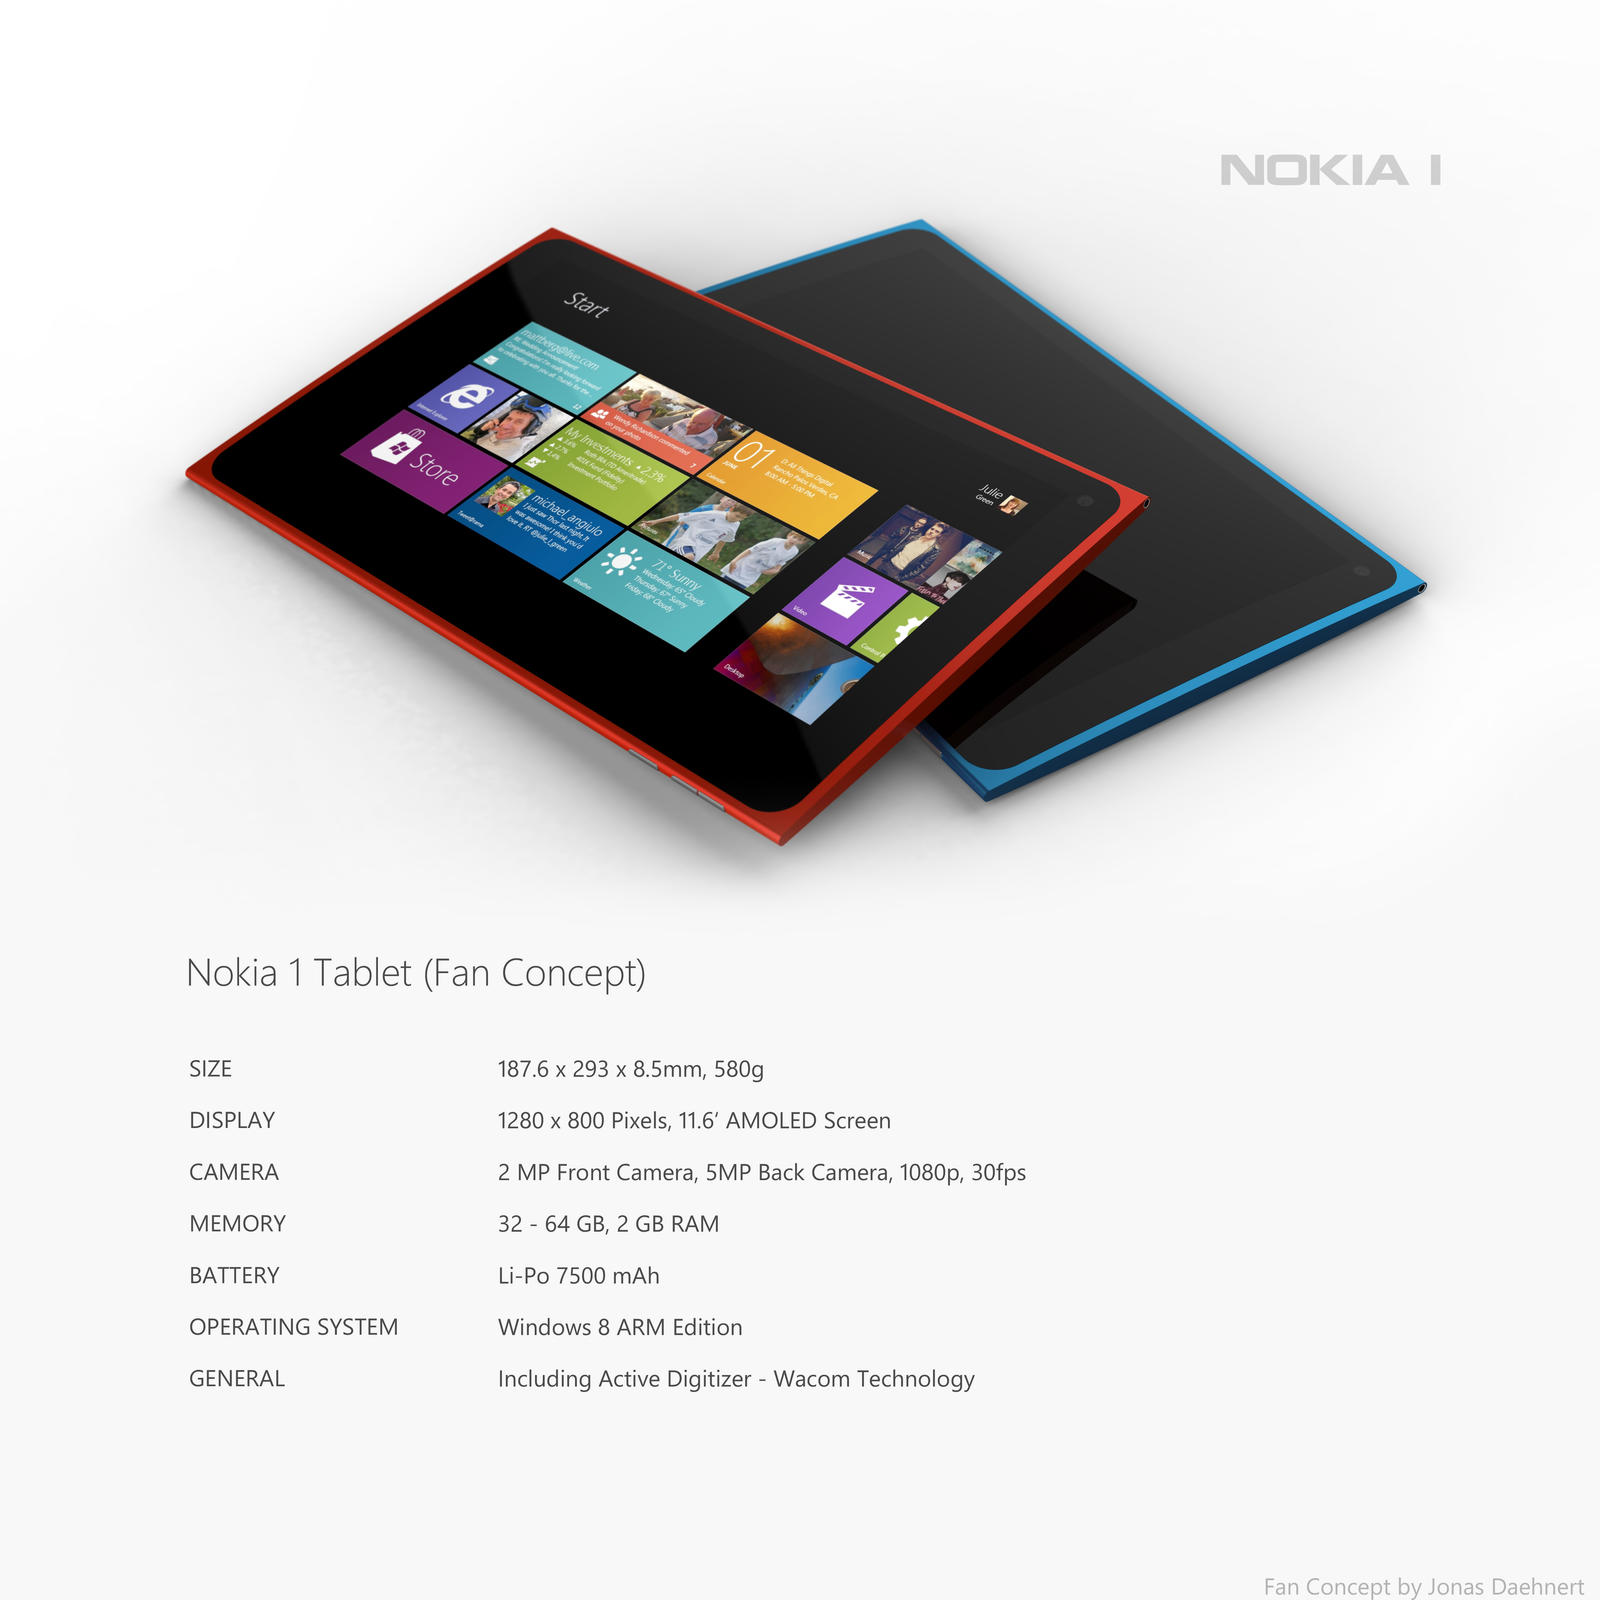 Nokia 1 Tablet